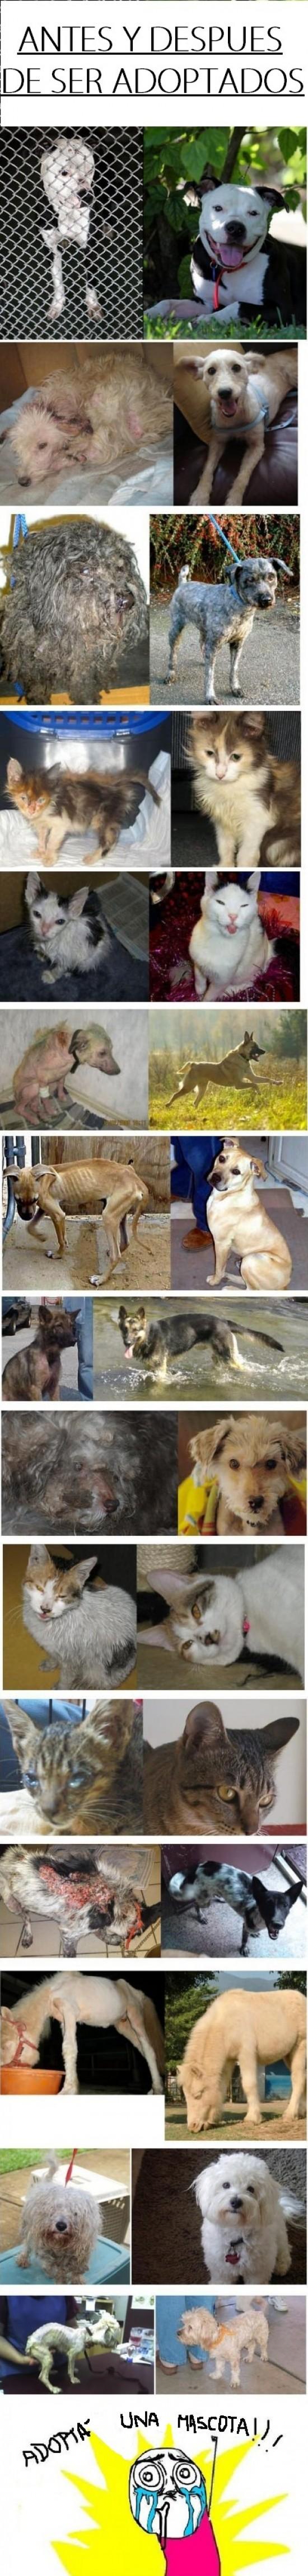 Otros - ¡Adopta una mascota!